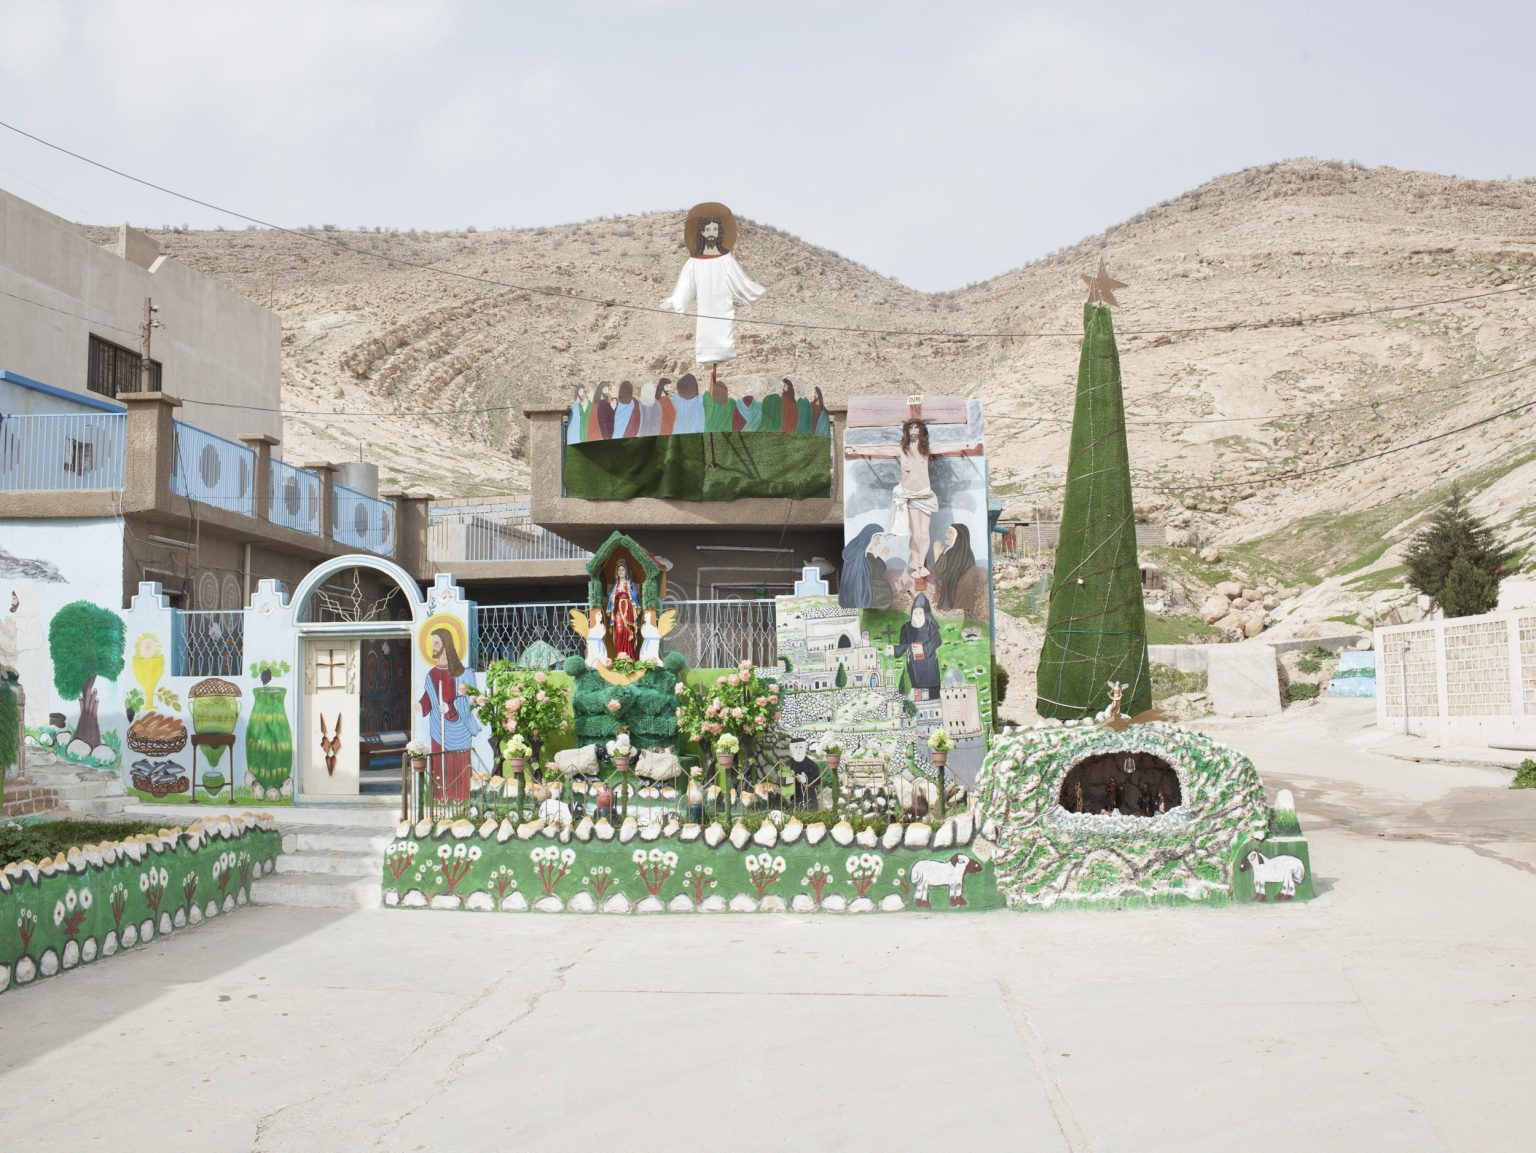 Decorations on a house of Alqosh, Christian town in the Nineveh Plain, in Iraqi Kurdistan.